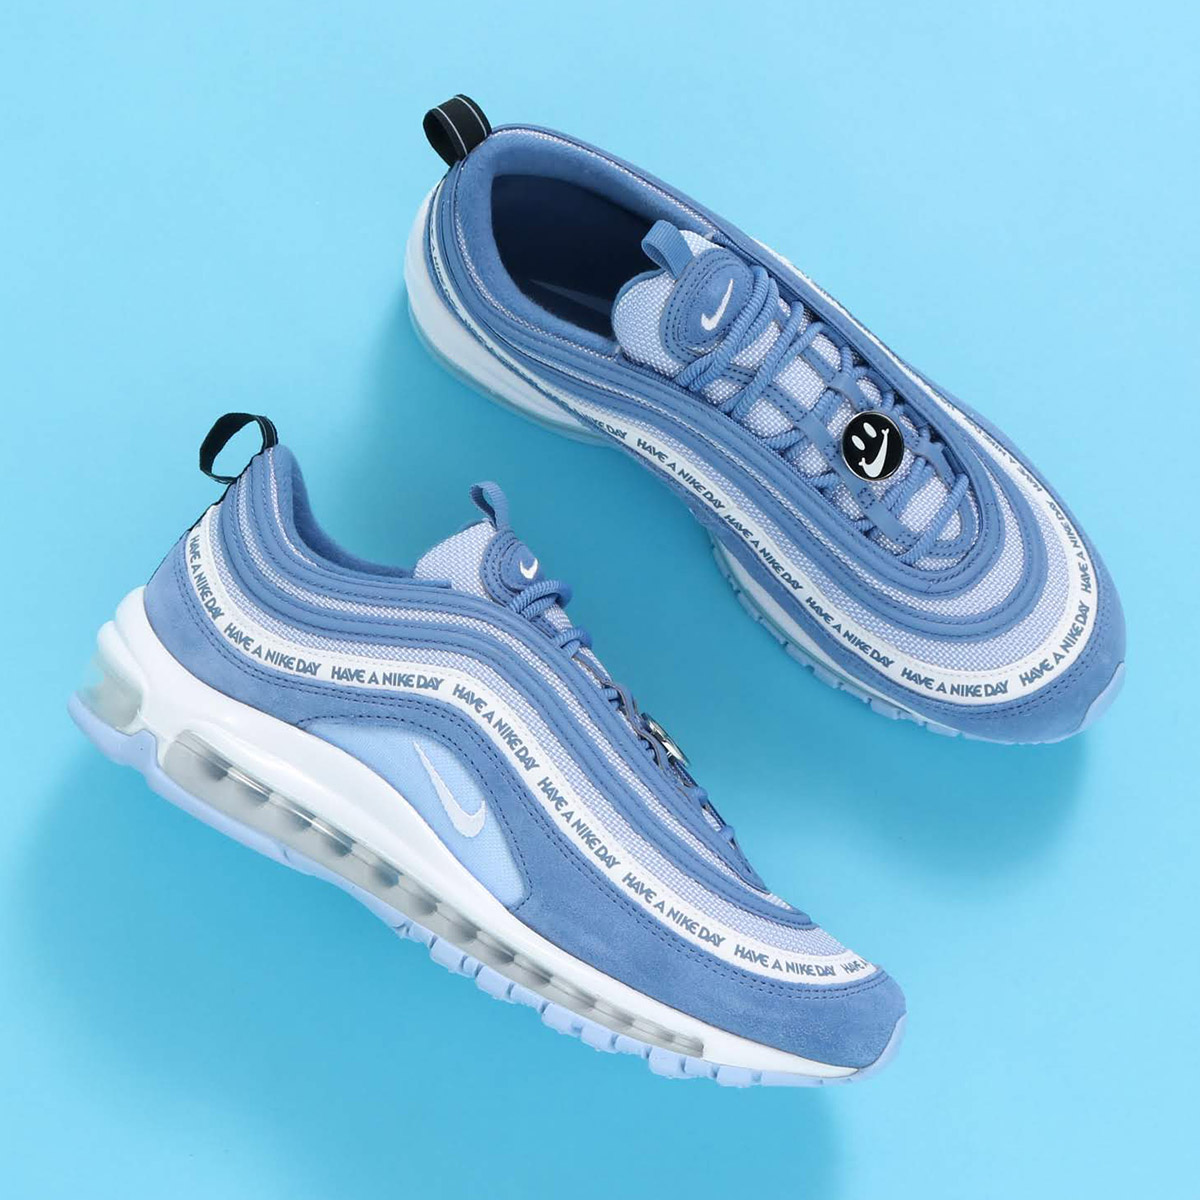 teléfono Cambiarse de ropa vestirse  Nike Air Max 97 ND Have A Nike Day Indigo Storm White Men Shoes BQ9130-400  Men Sporting Goods